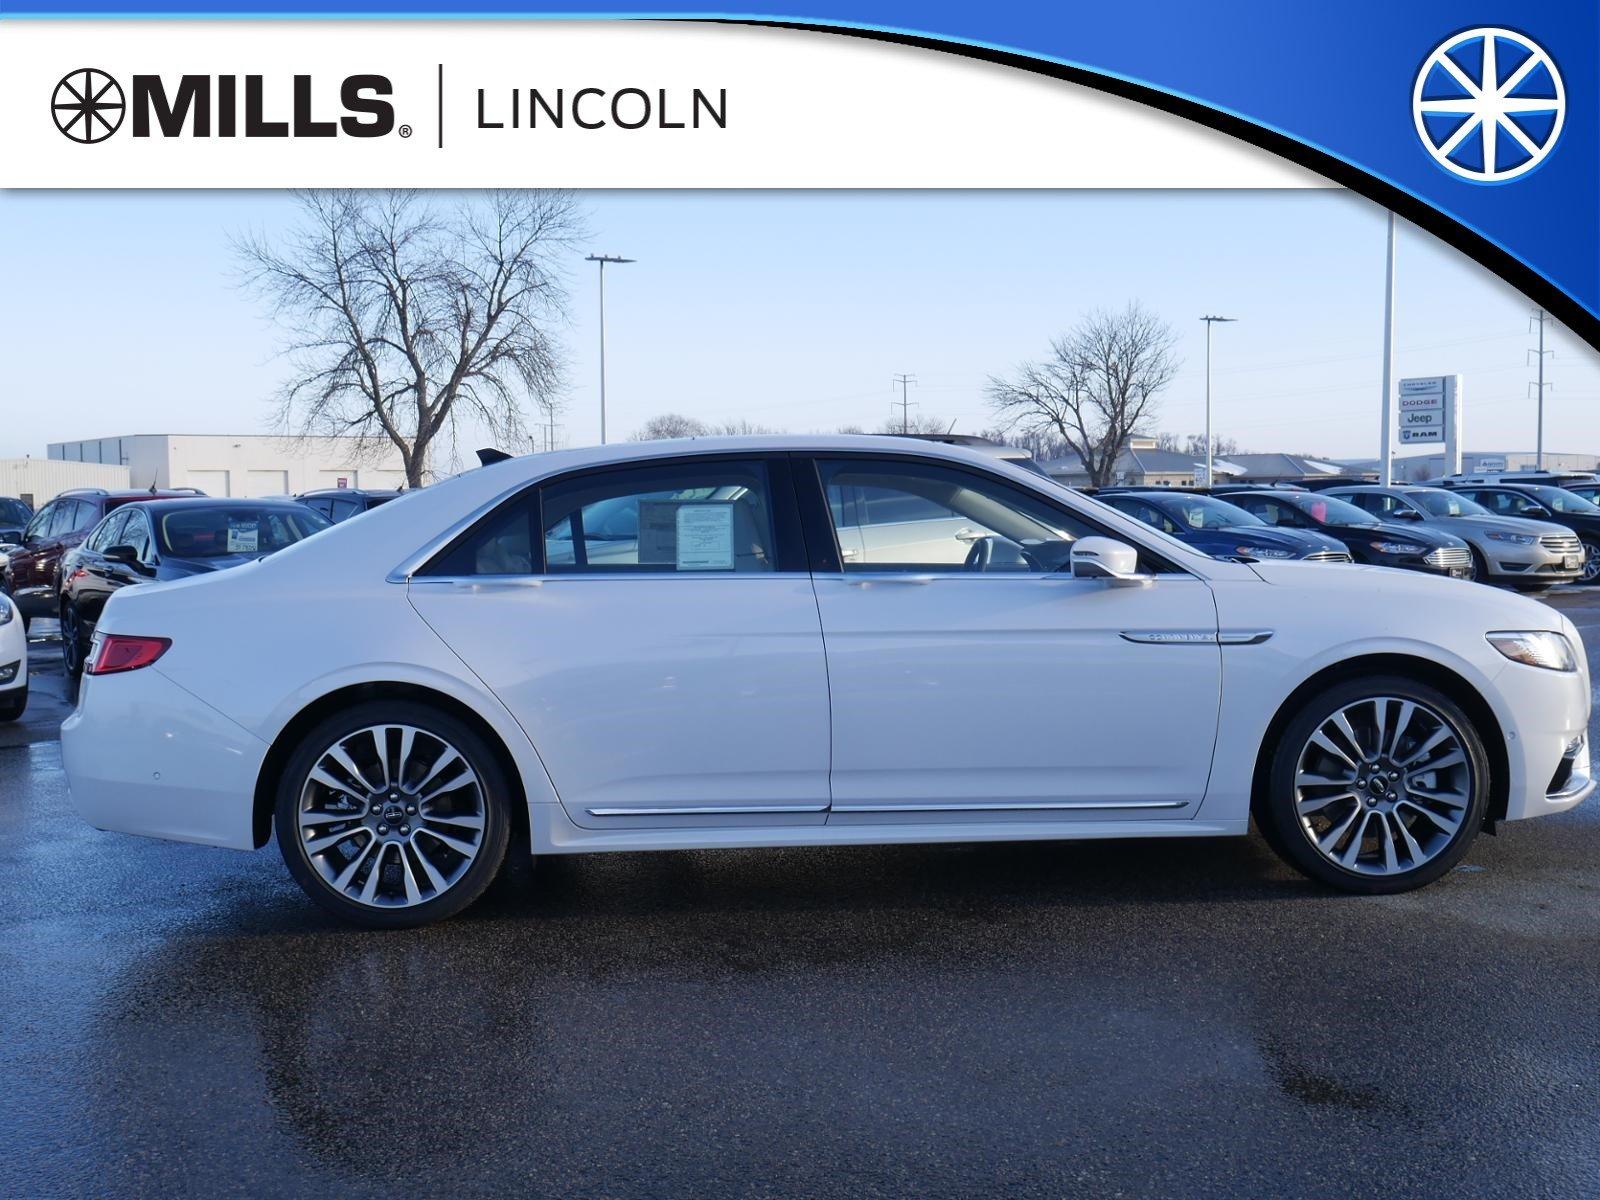 2019 Lincoln Continental Car